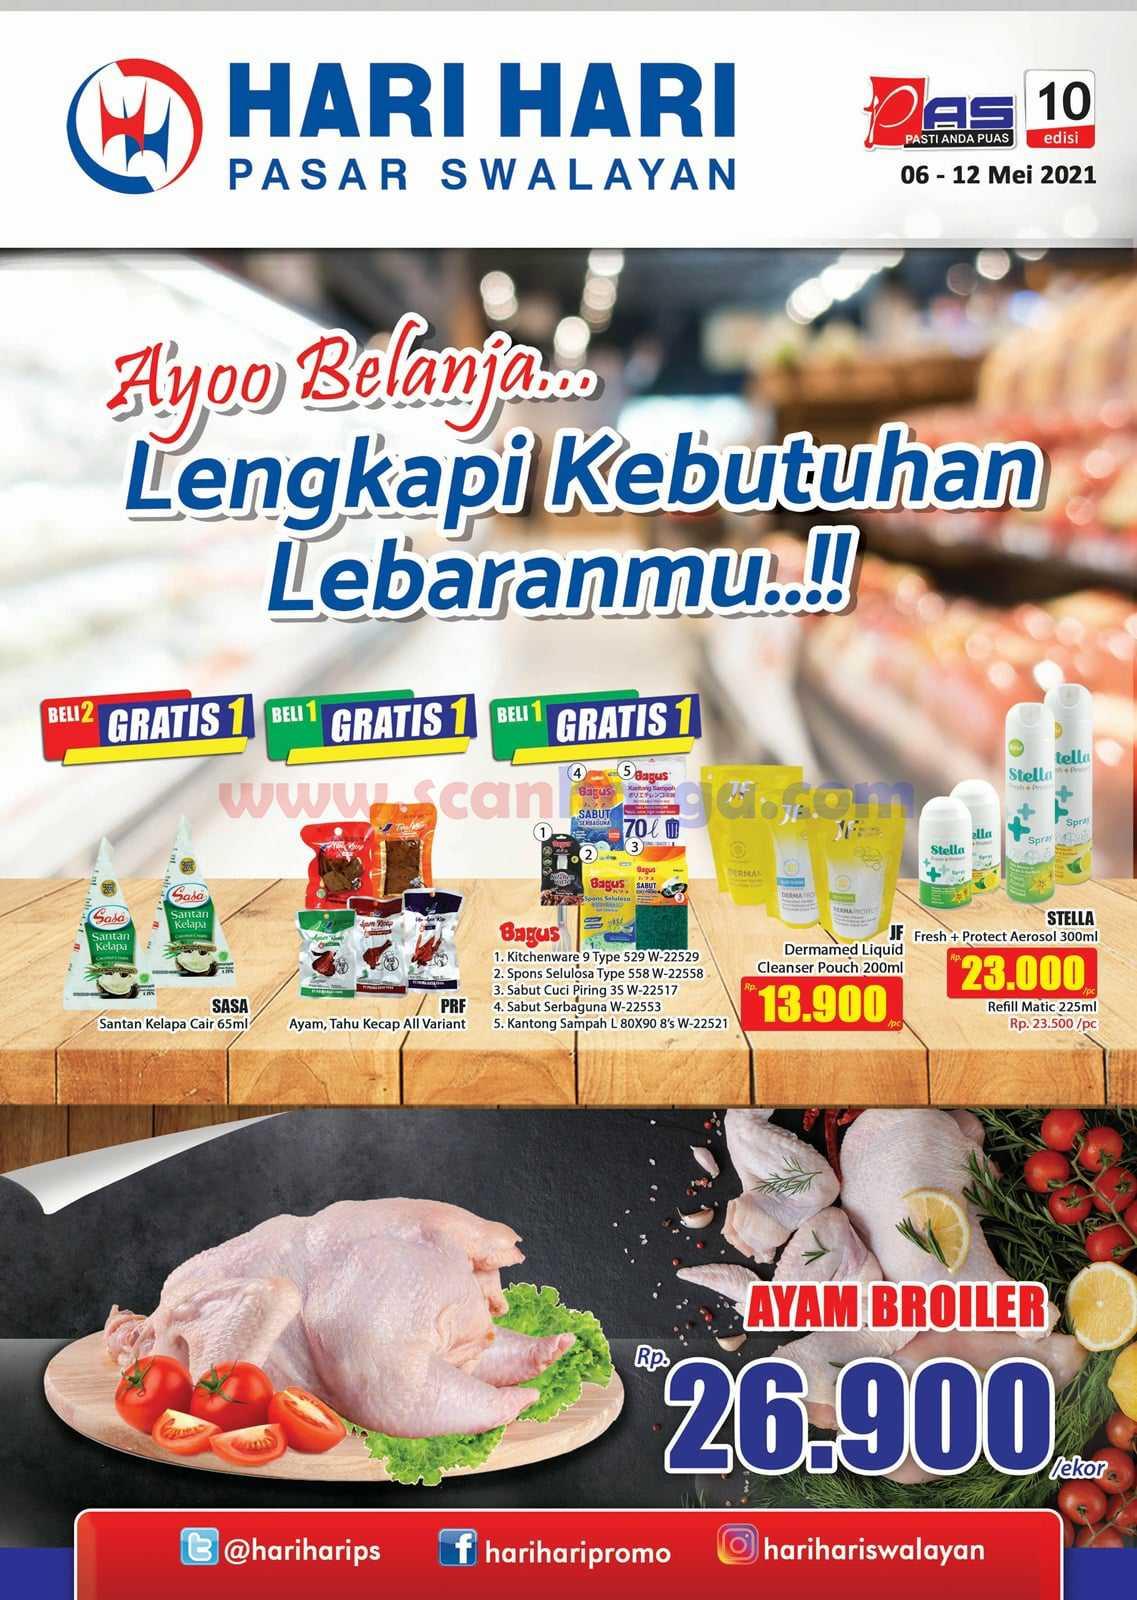 Katalog Promo Hari Hari Pasar Swalayan 6 - 12 Mei 2021